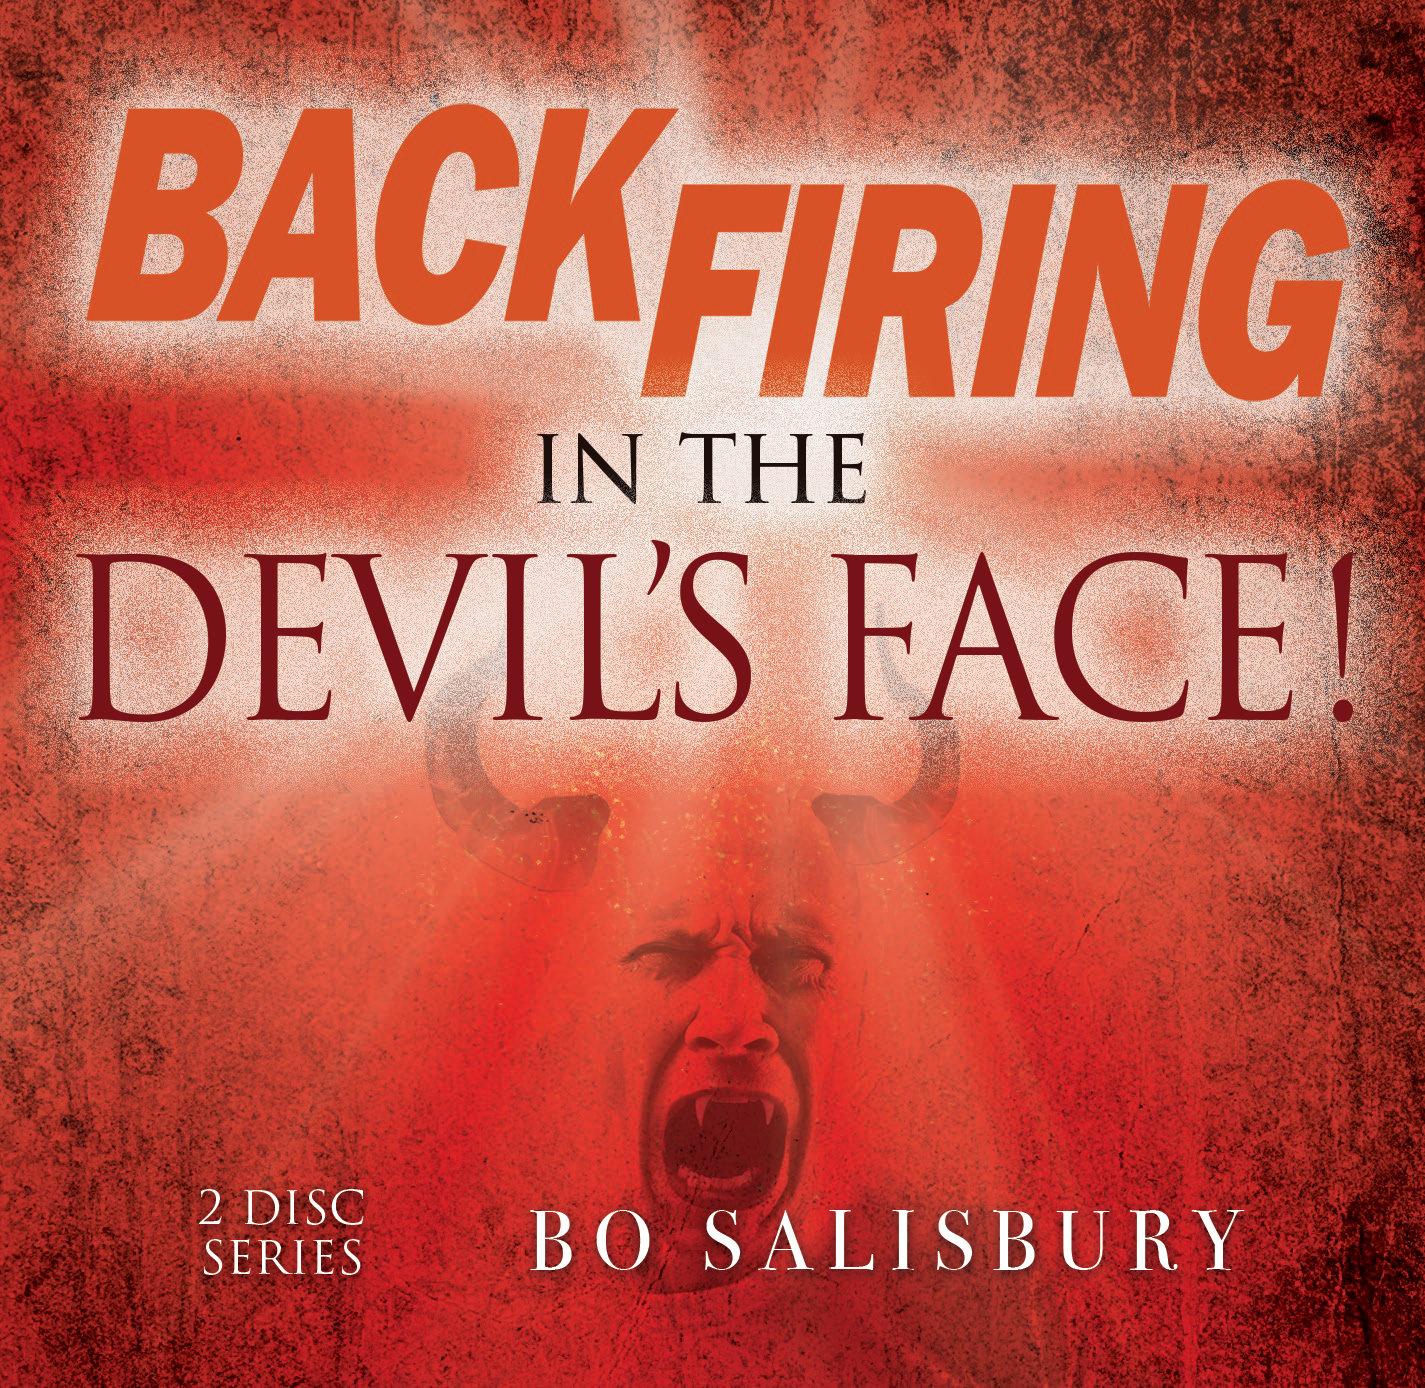 Backfiring in the Devil's Face! (MP3 download)